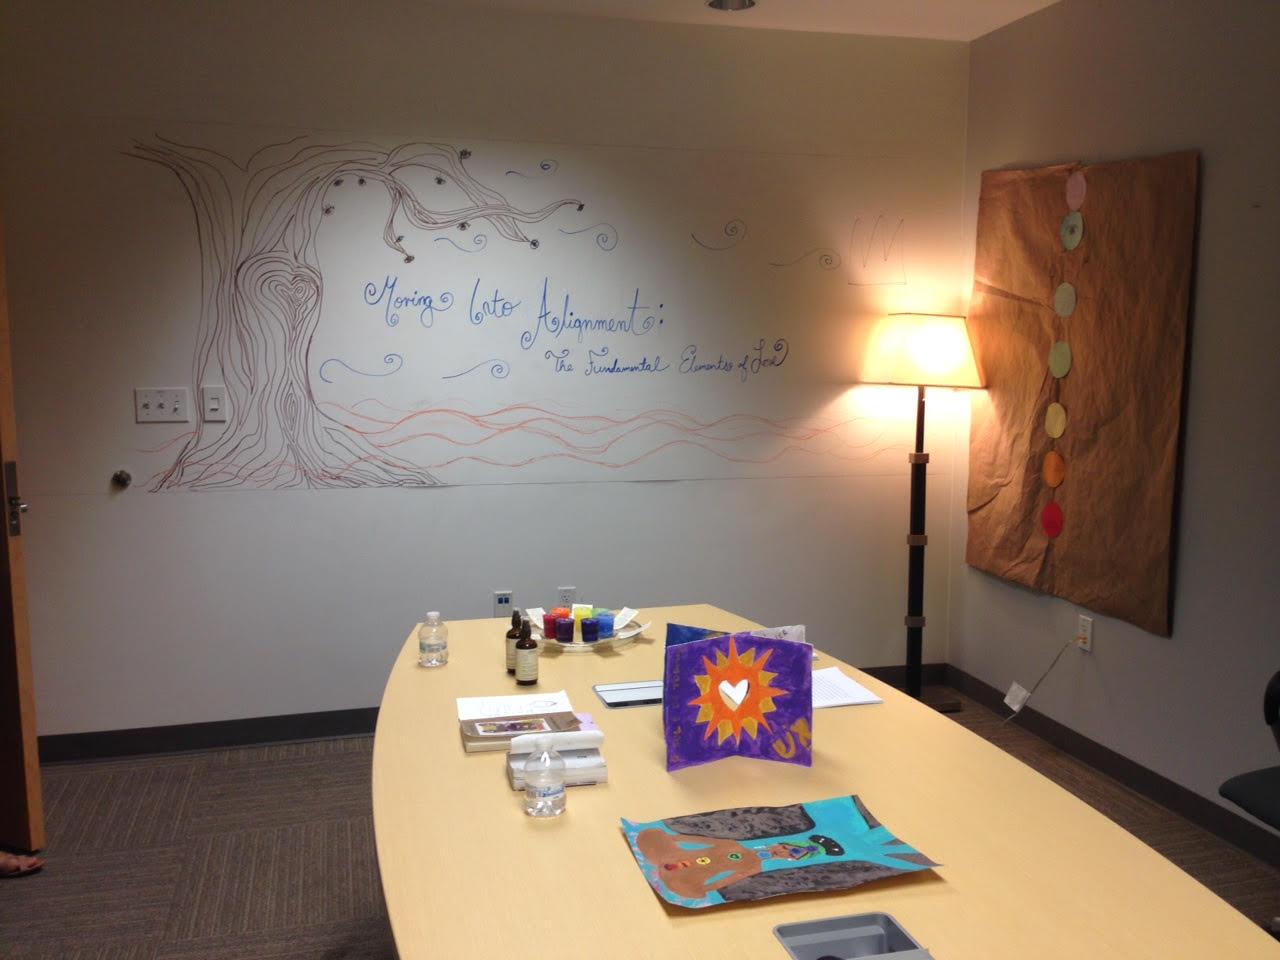 Moving Into Alignment Meditation Room